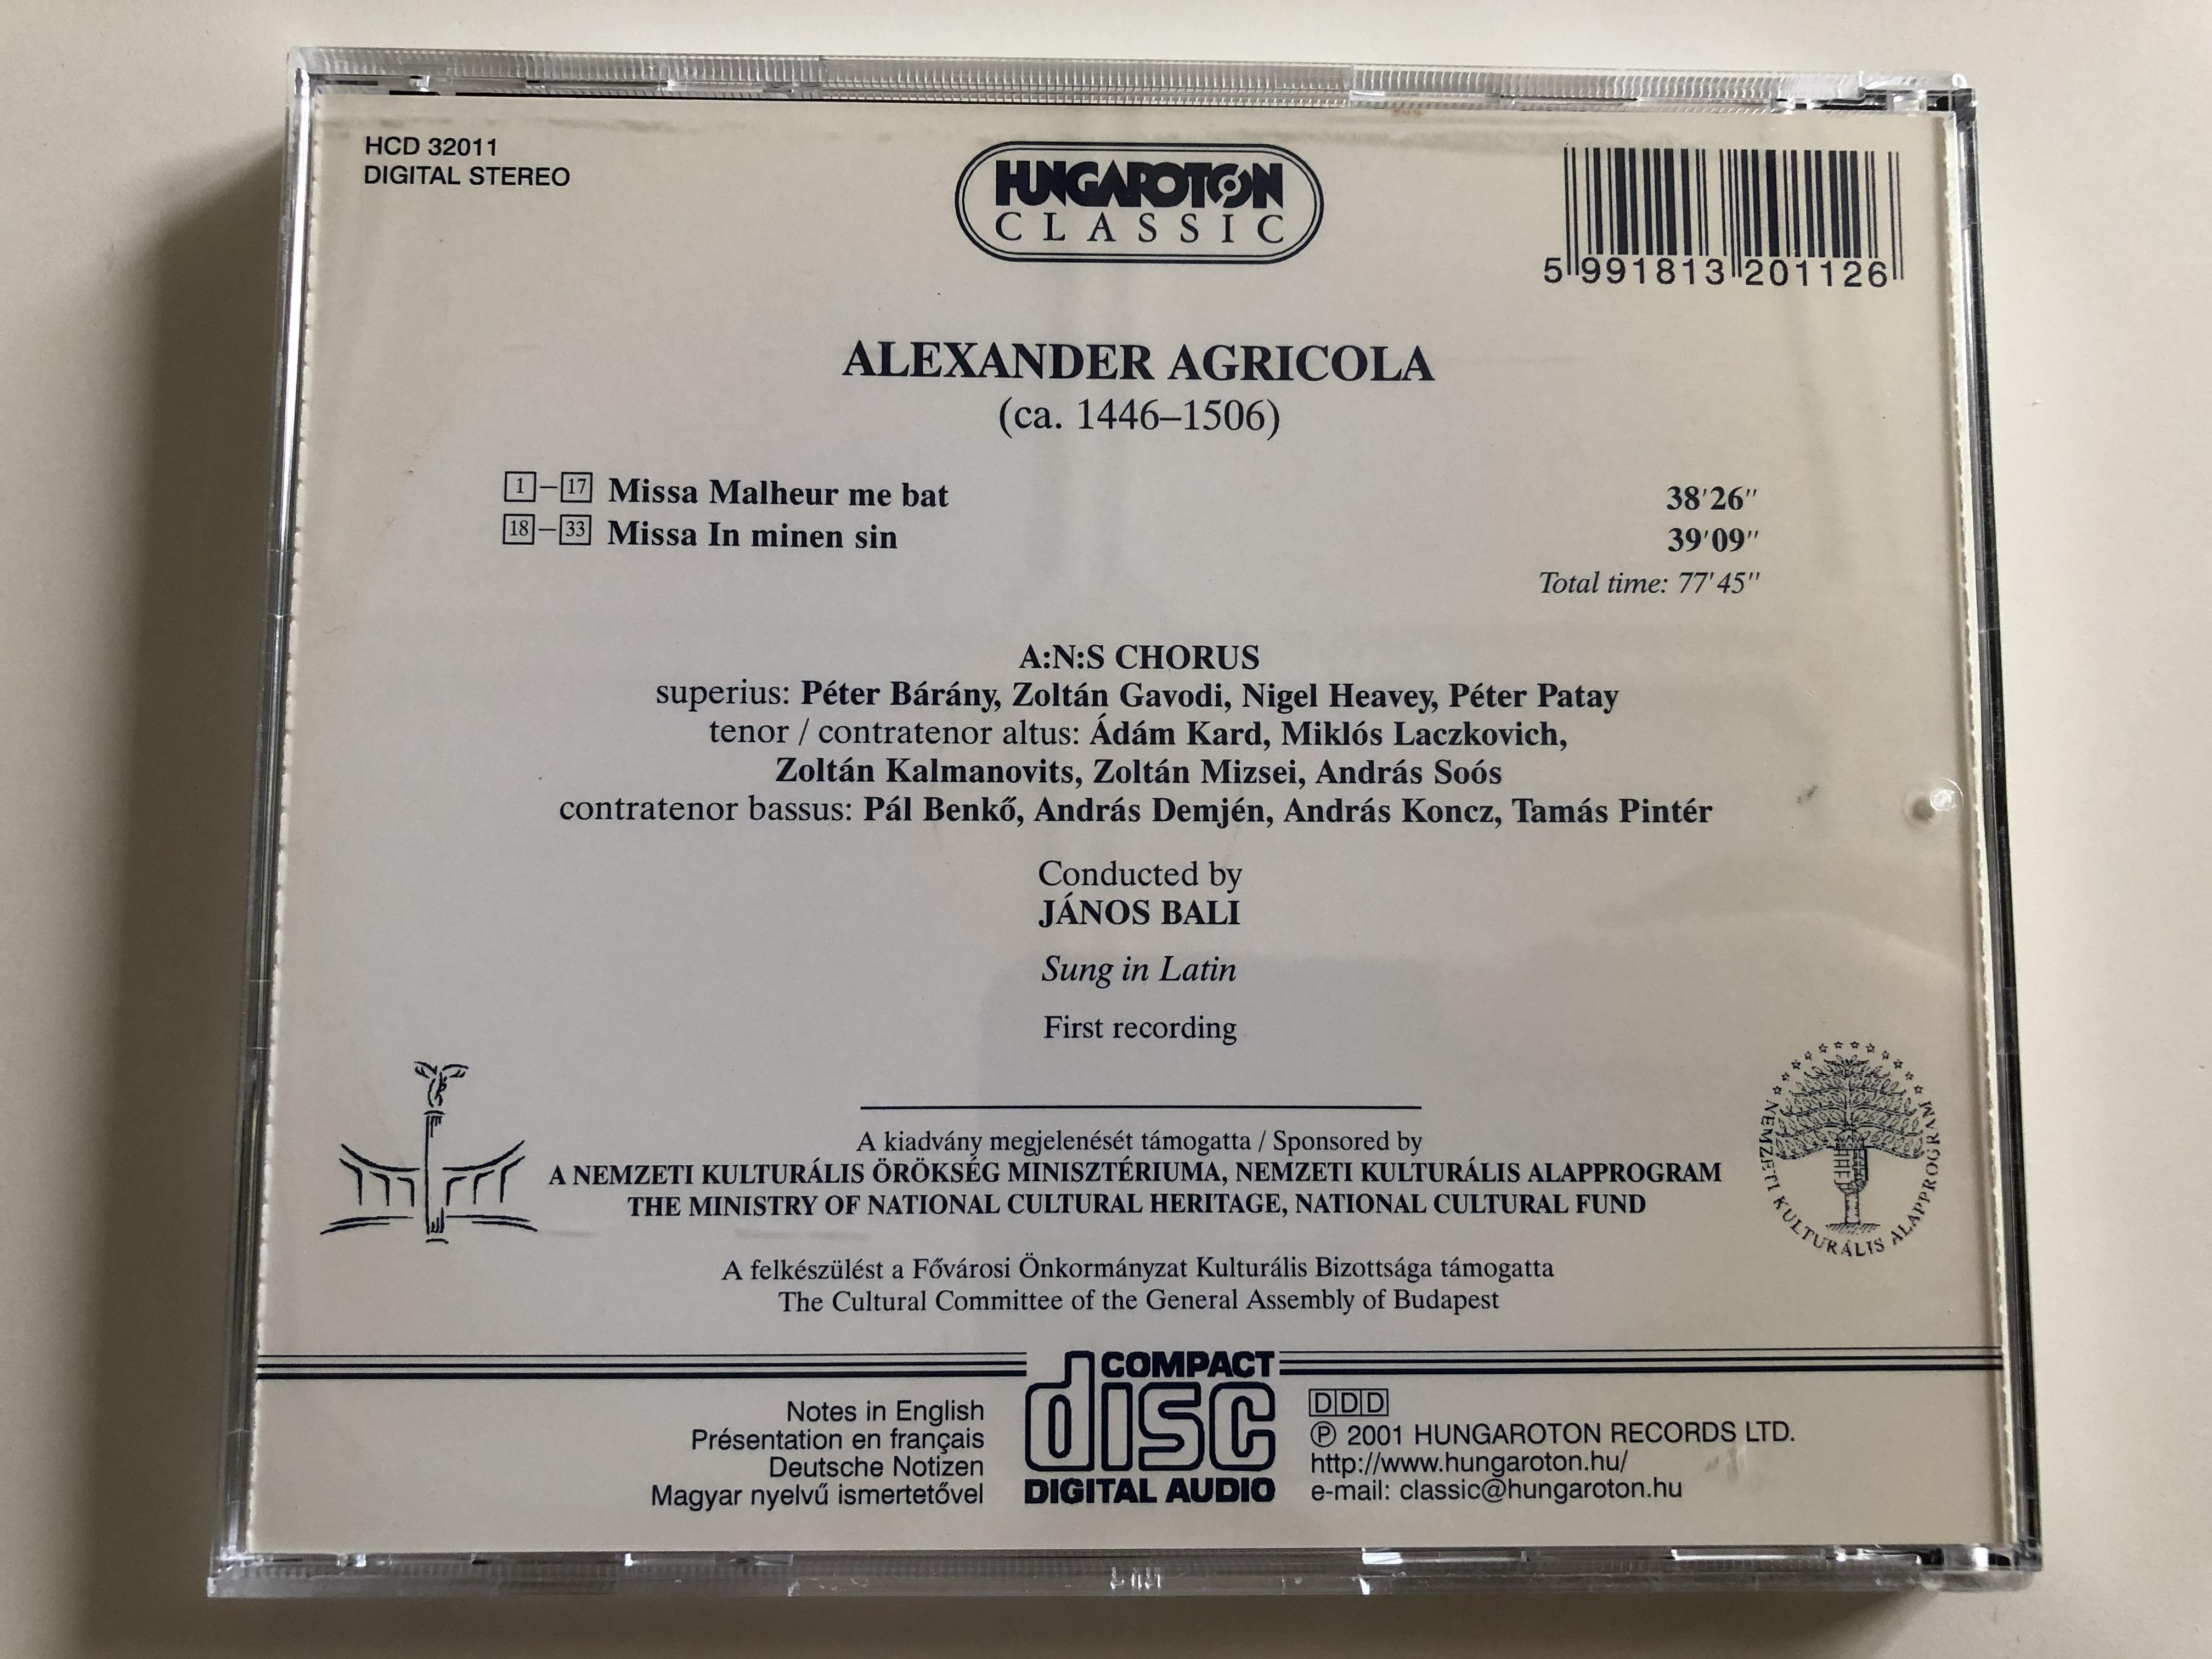 agricola-missa-malheur-me-bat-missa-in-minen-sin-ans-chorus-j-nos-bali-hungaroton-classic-audio-cd-2001-hcd-32011-7-.jpg